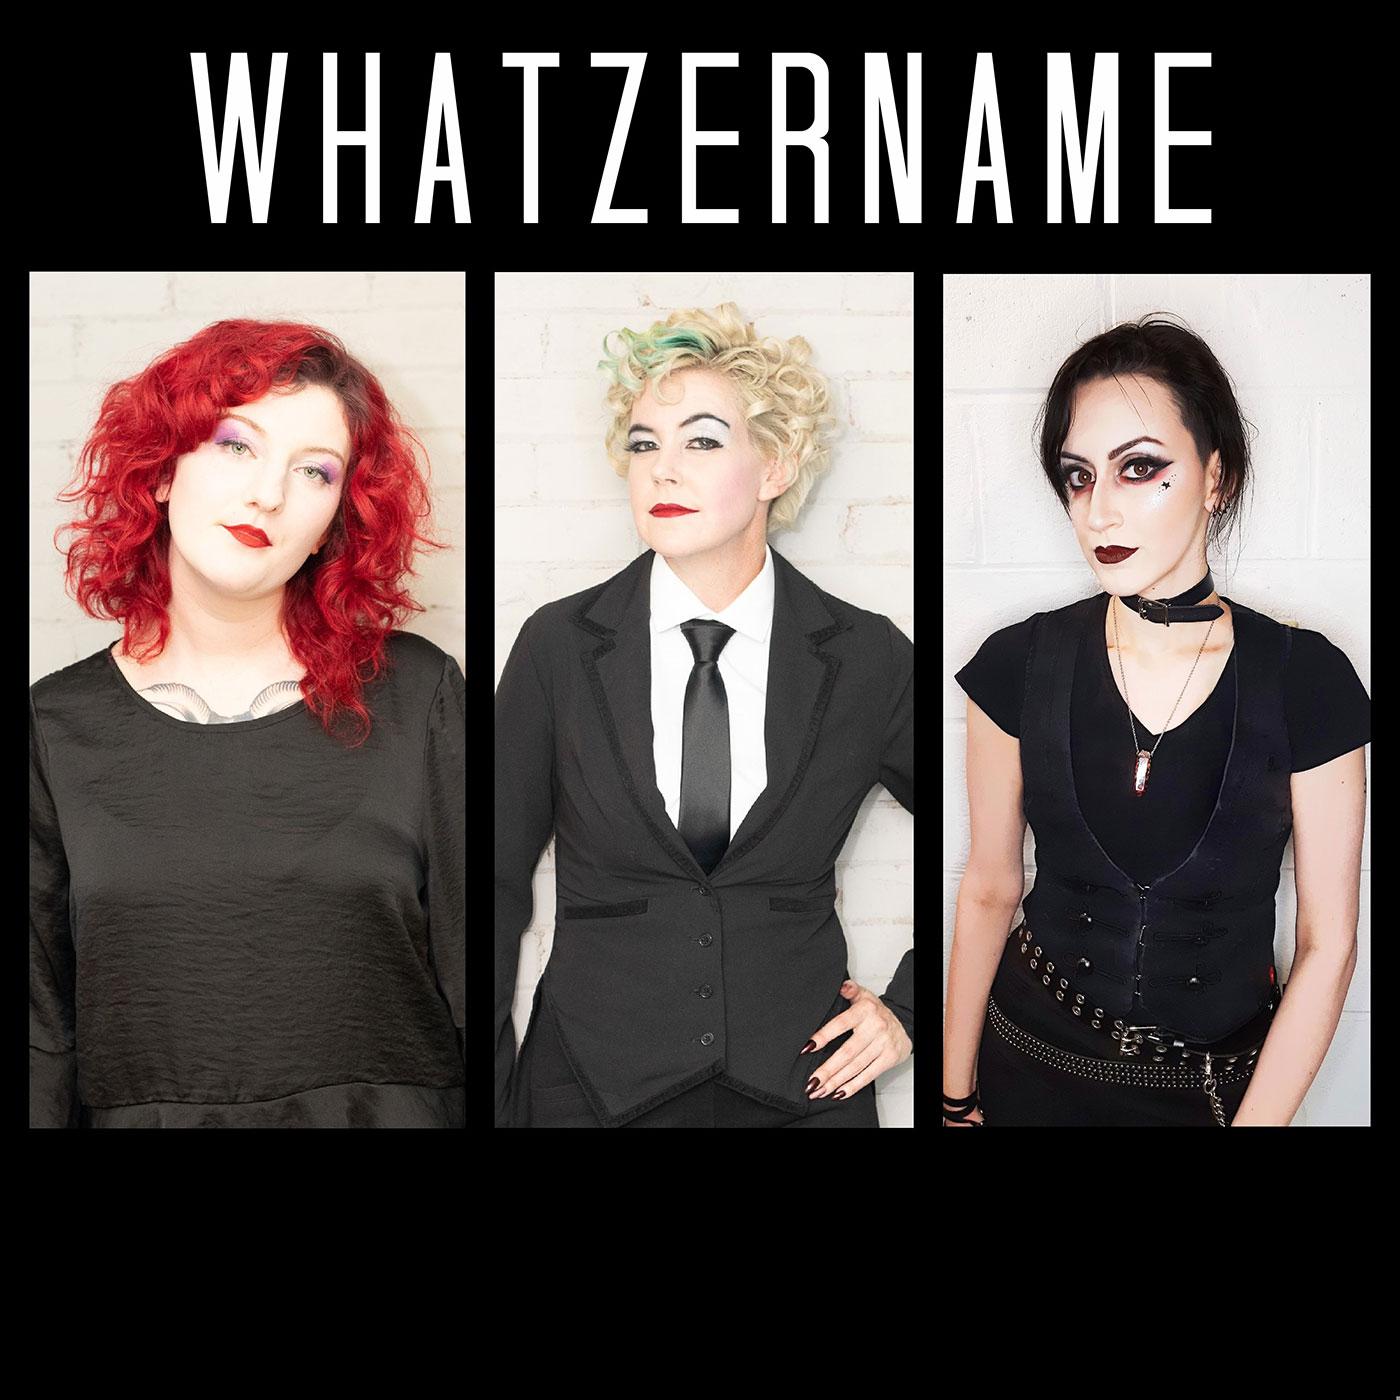 Whatzername